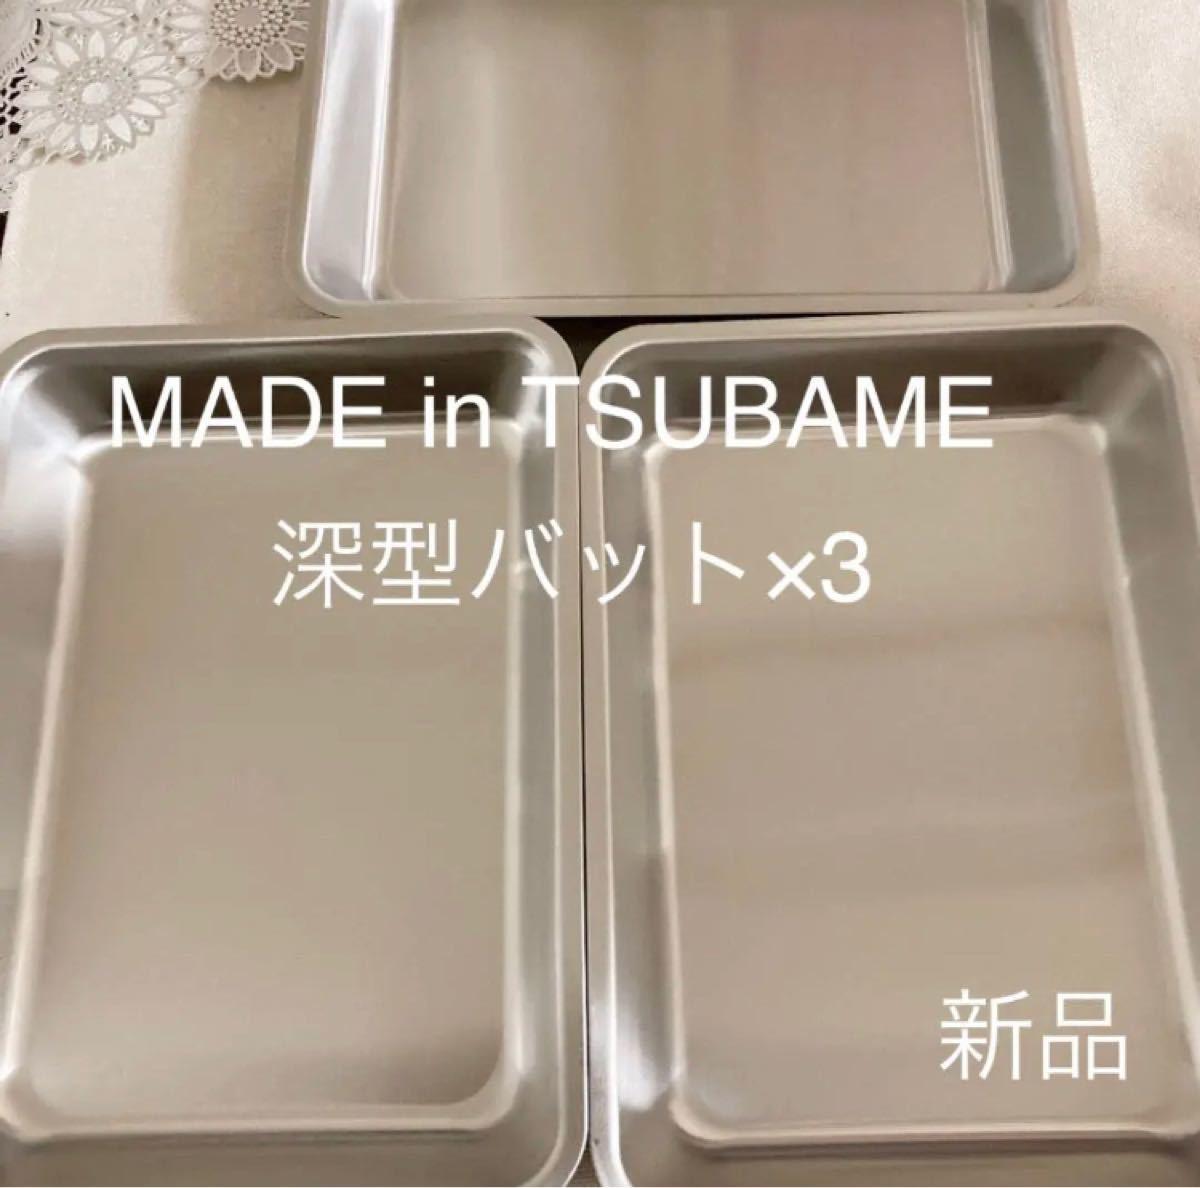 MADE in TSUBAME 深型ステンレスバット 3枚セット 新品 下ごしらえ・衣付けに 日本製 新潟県燕市燕三条 刻印入り